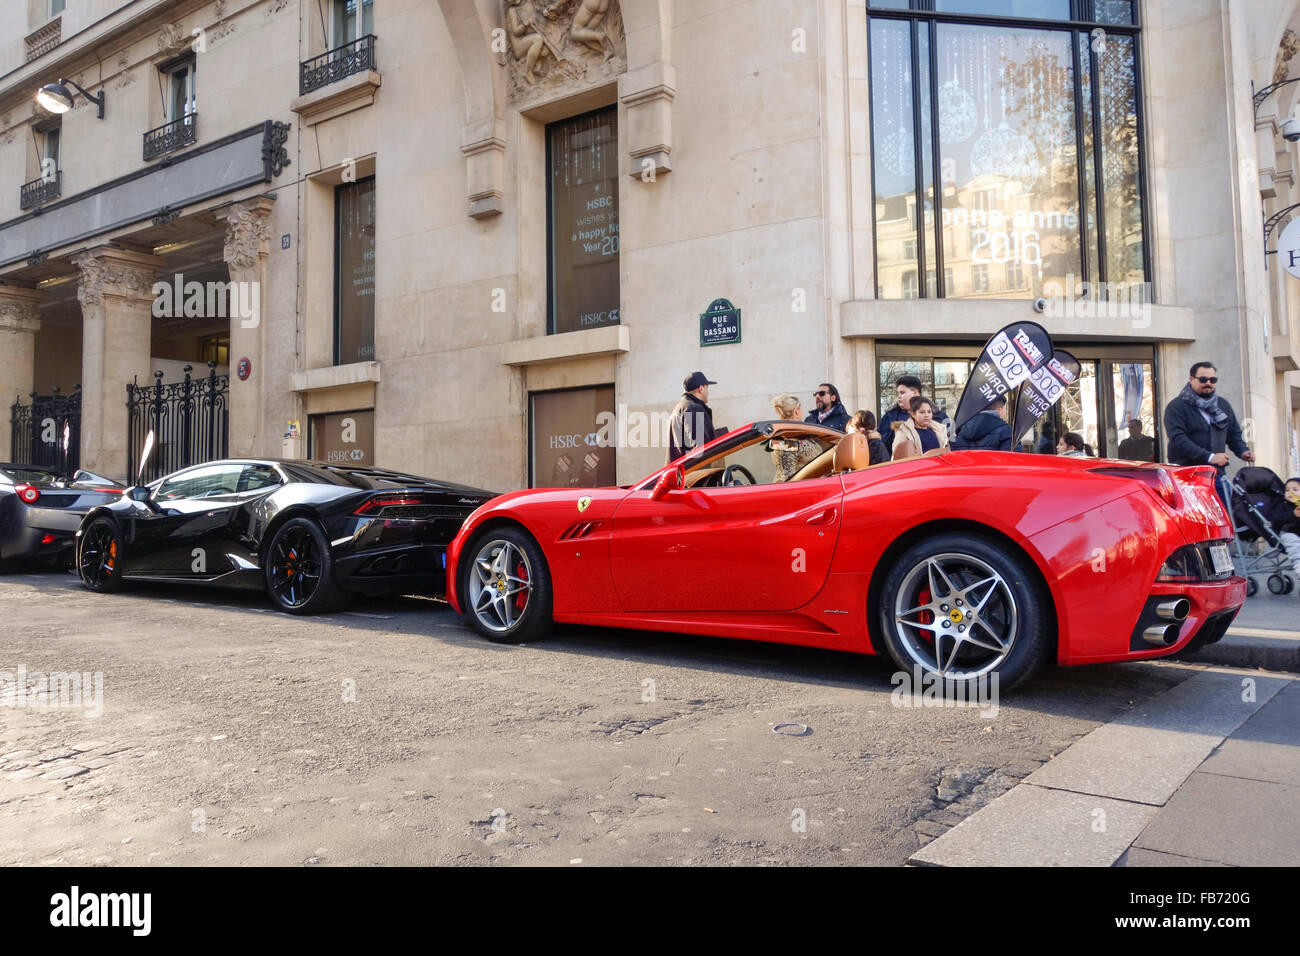 Lamborghini And A Ferrari For Rent At A Luxury Car Hire Company At